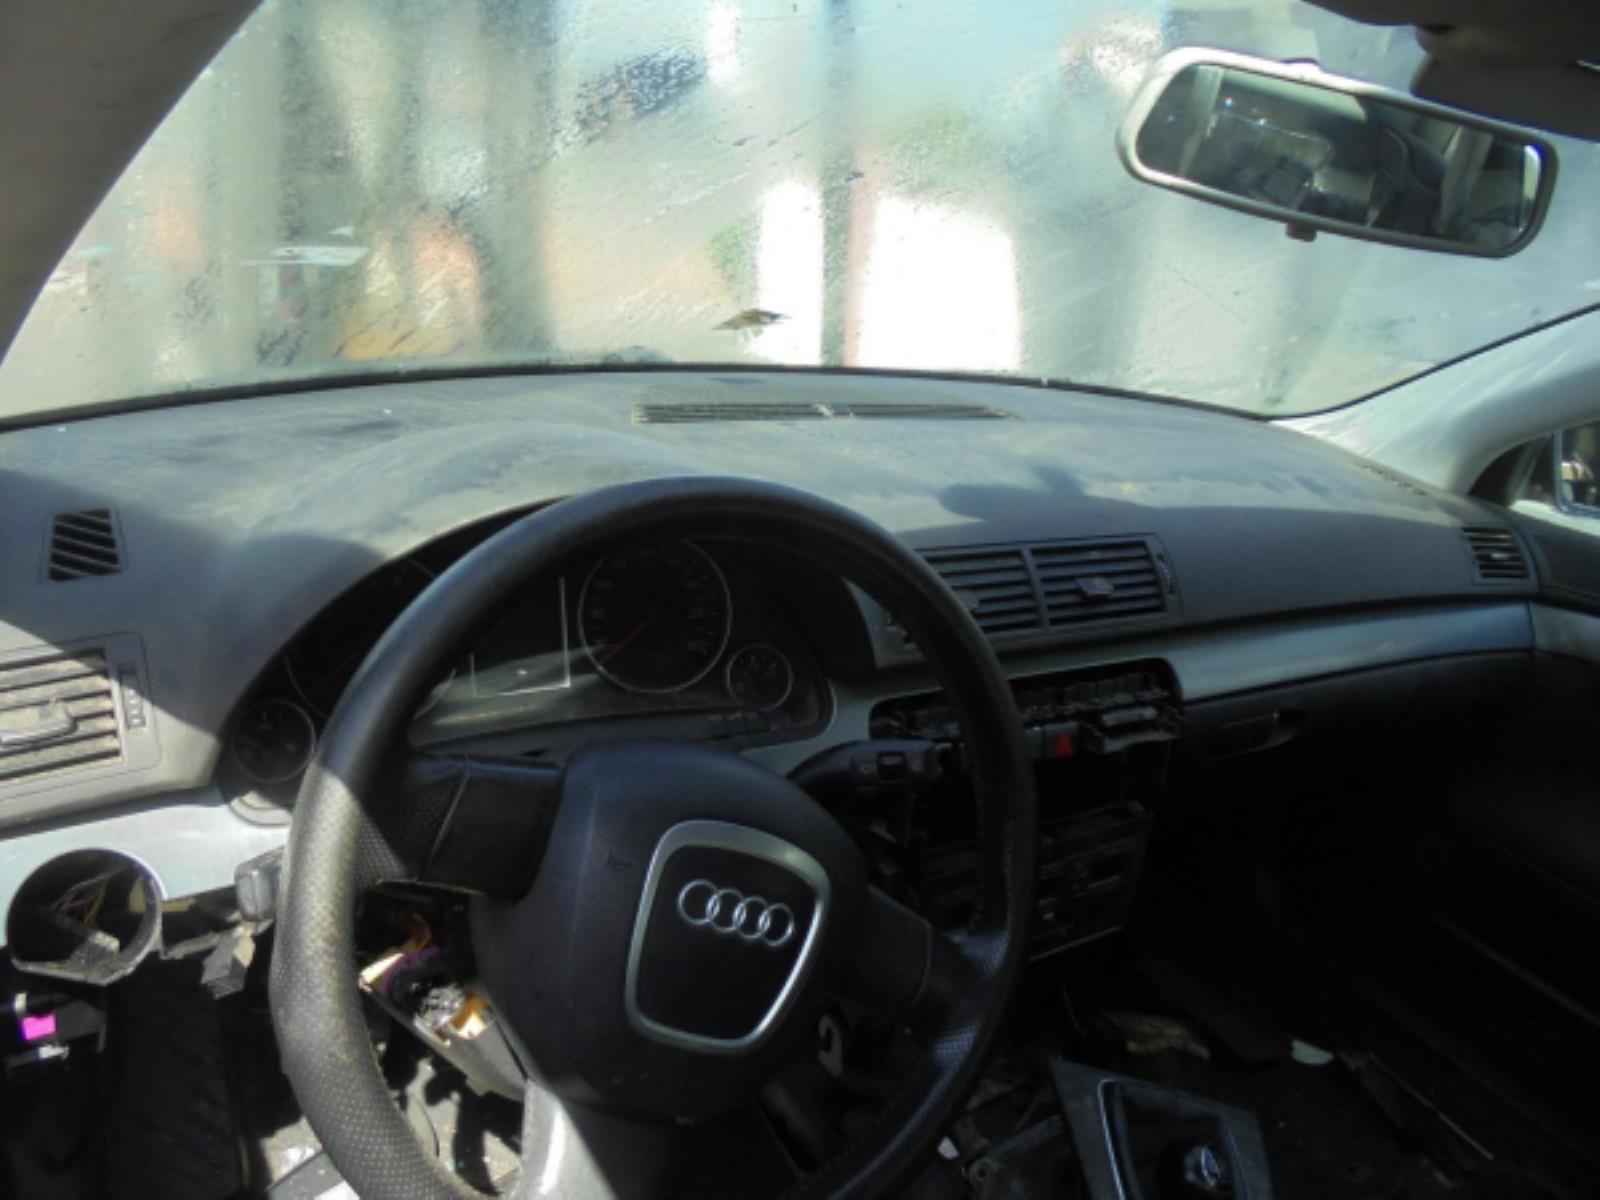 Picture of Αερόσακος  Set  AUDI A4 (2005-2008)     οδηγού συνοδηγού με ταμπλό ζώνες, εγκέφαλος